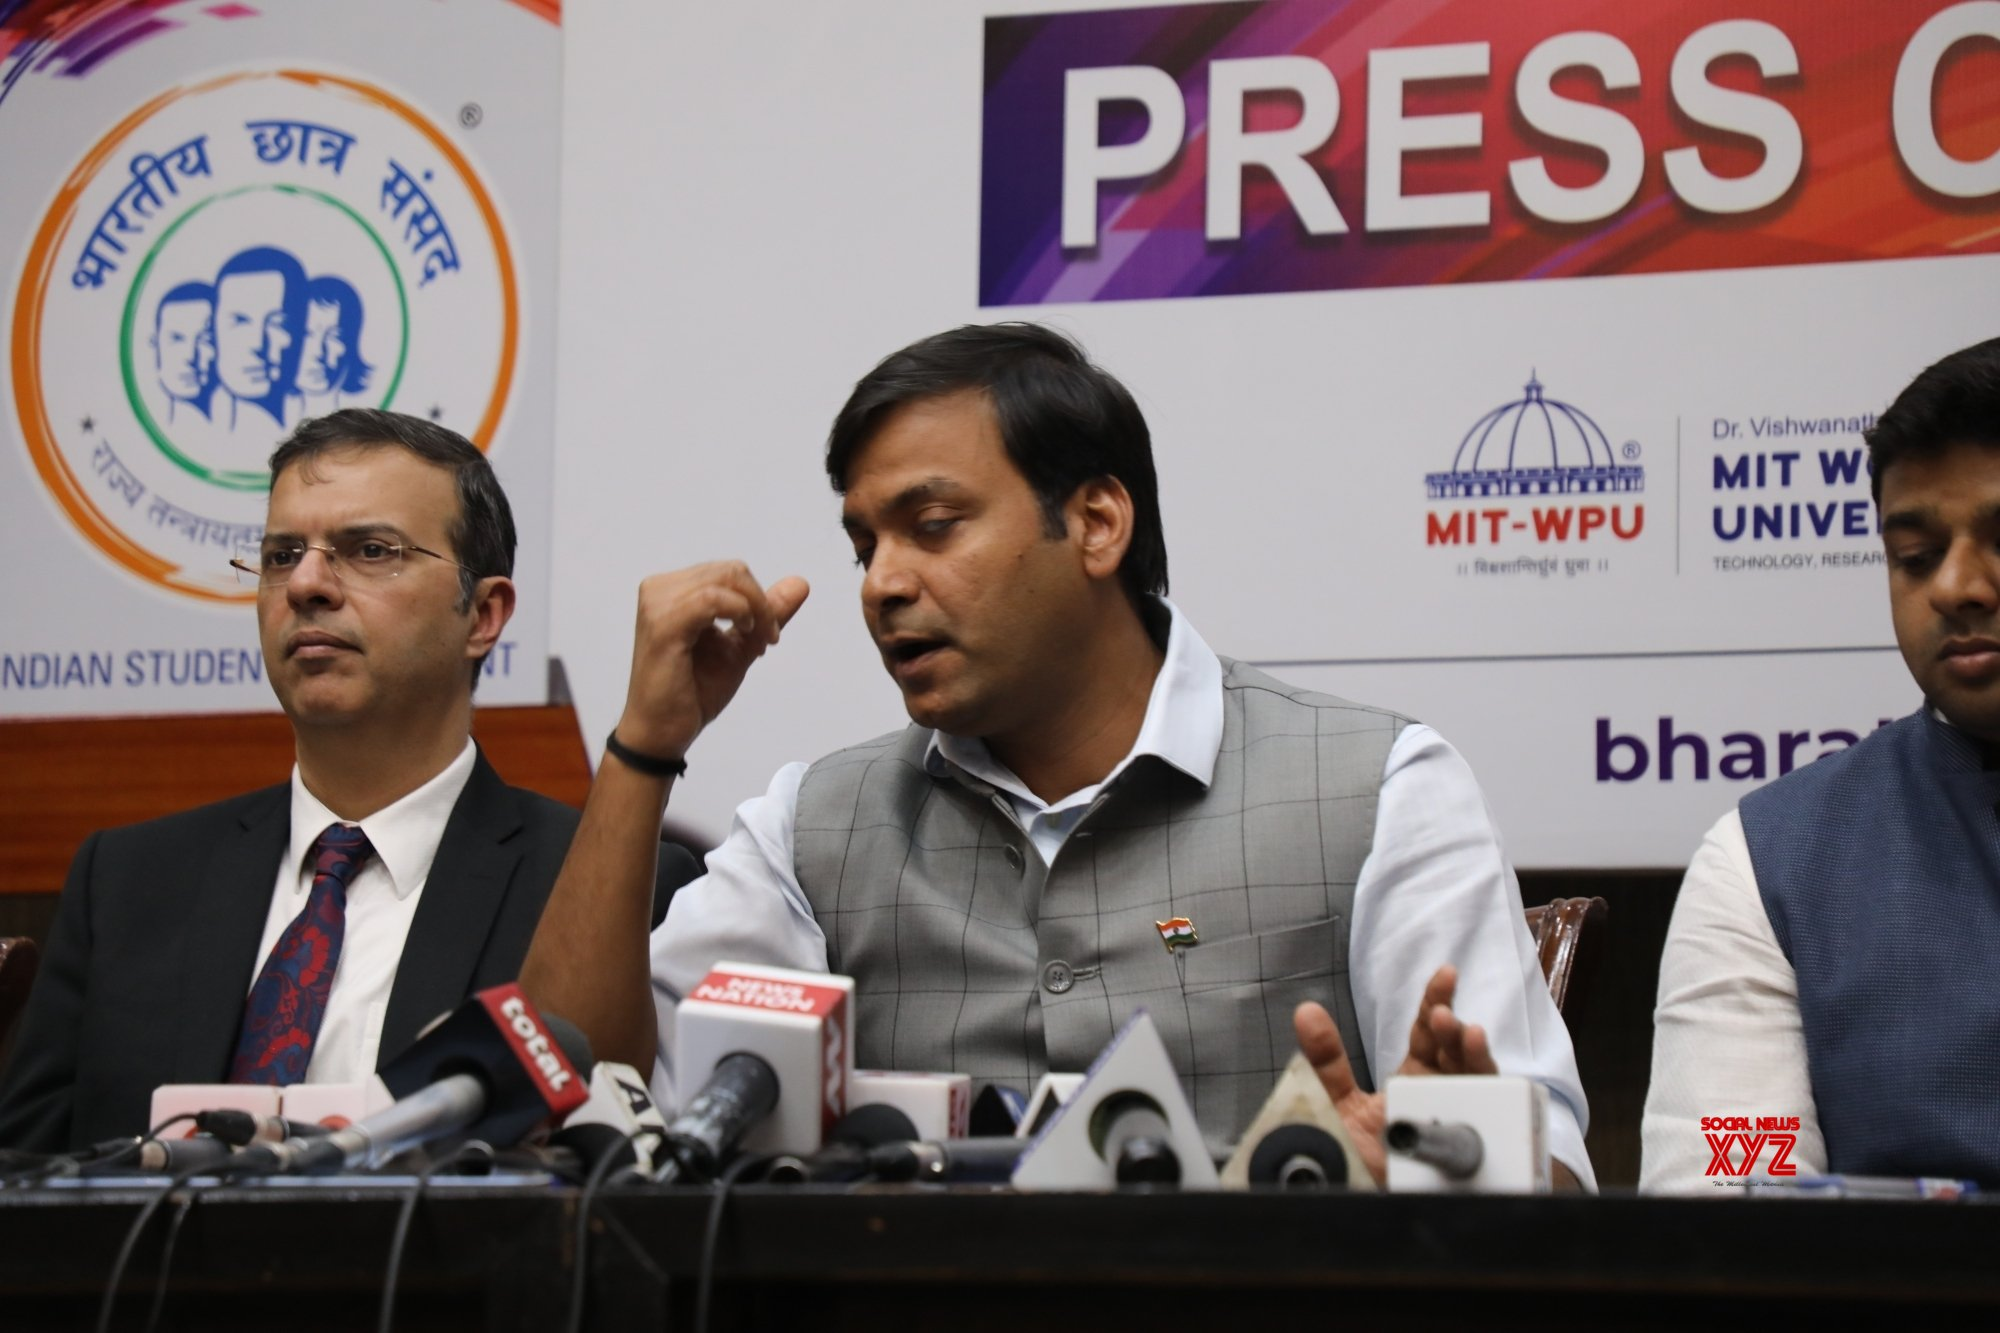 New Delhi: Rahul Karad's press conference #Gallery